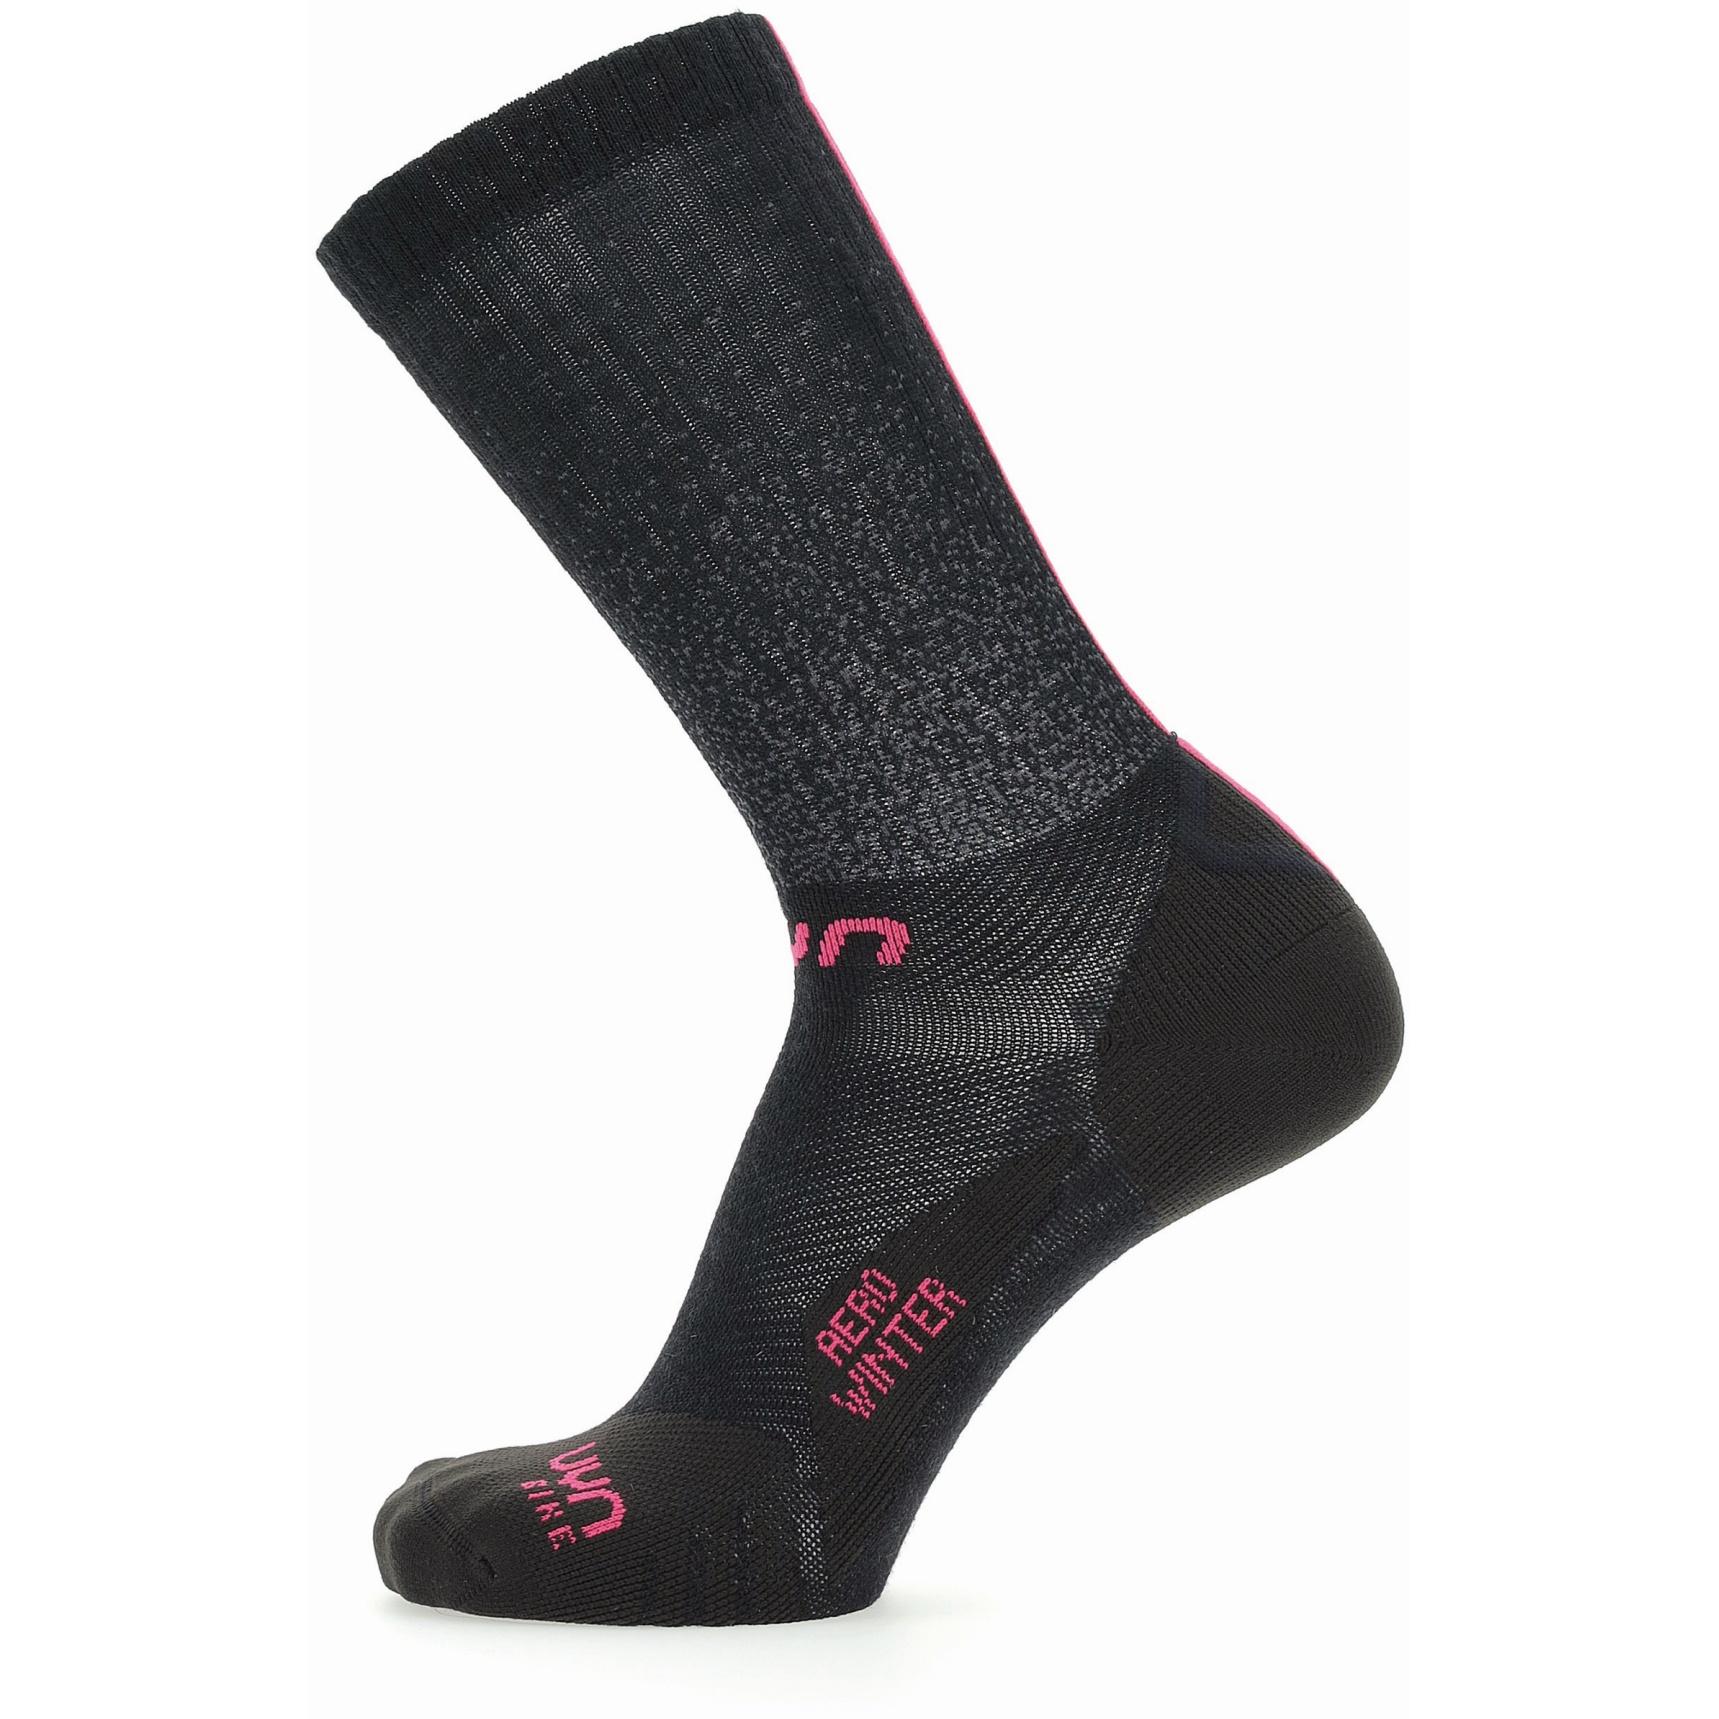 Image of UYN Cycling Aero Winter Socks Women - Black/Pink